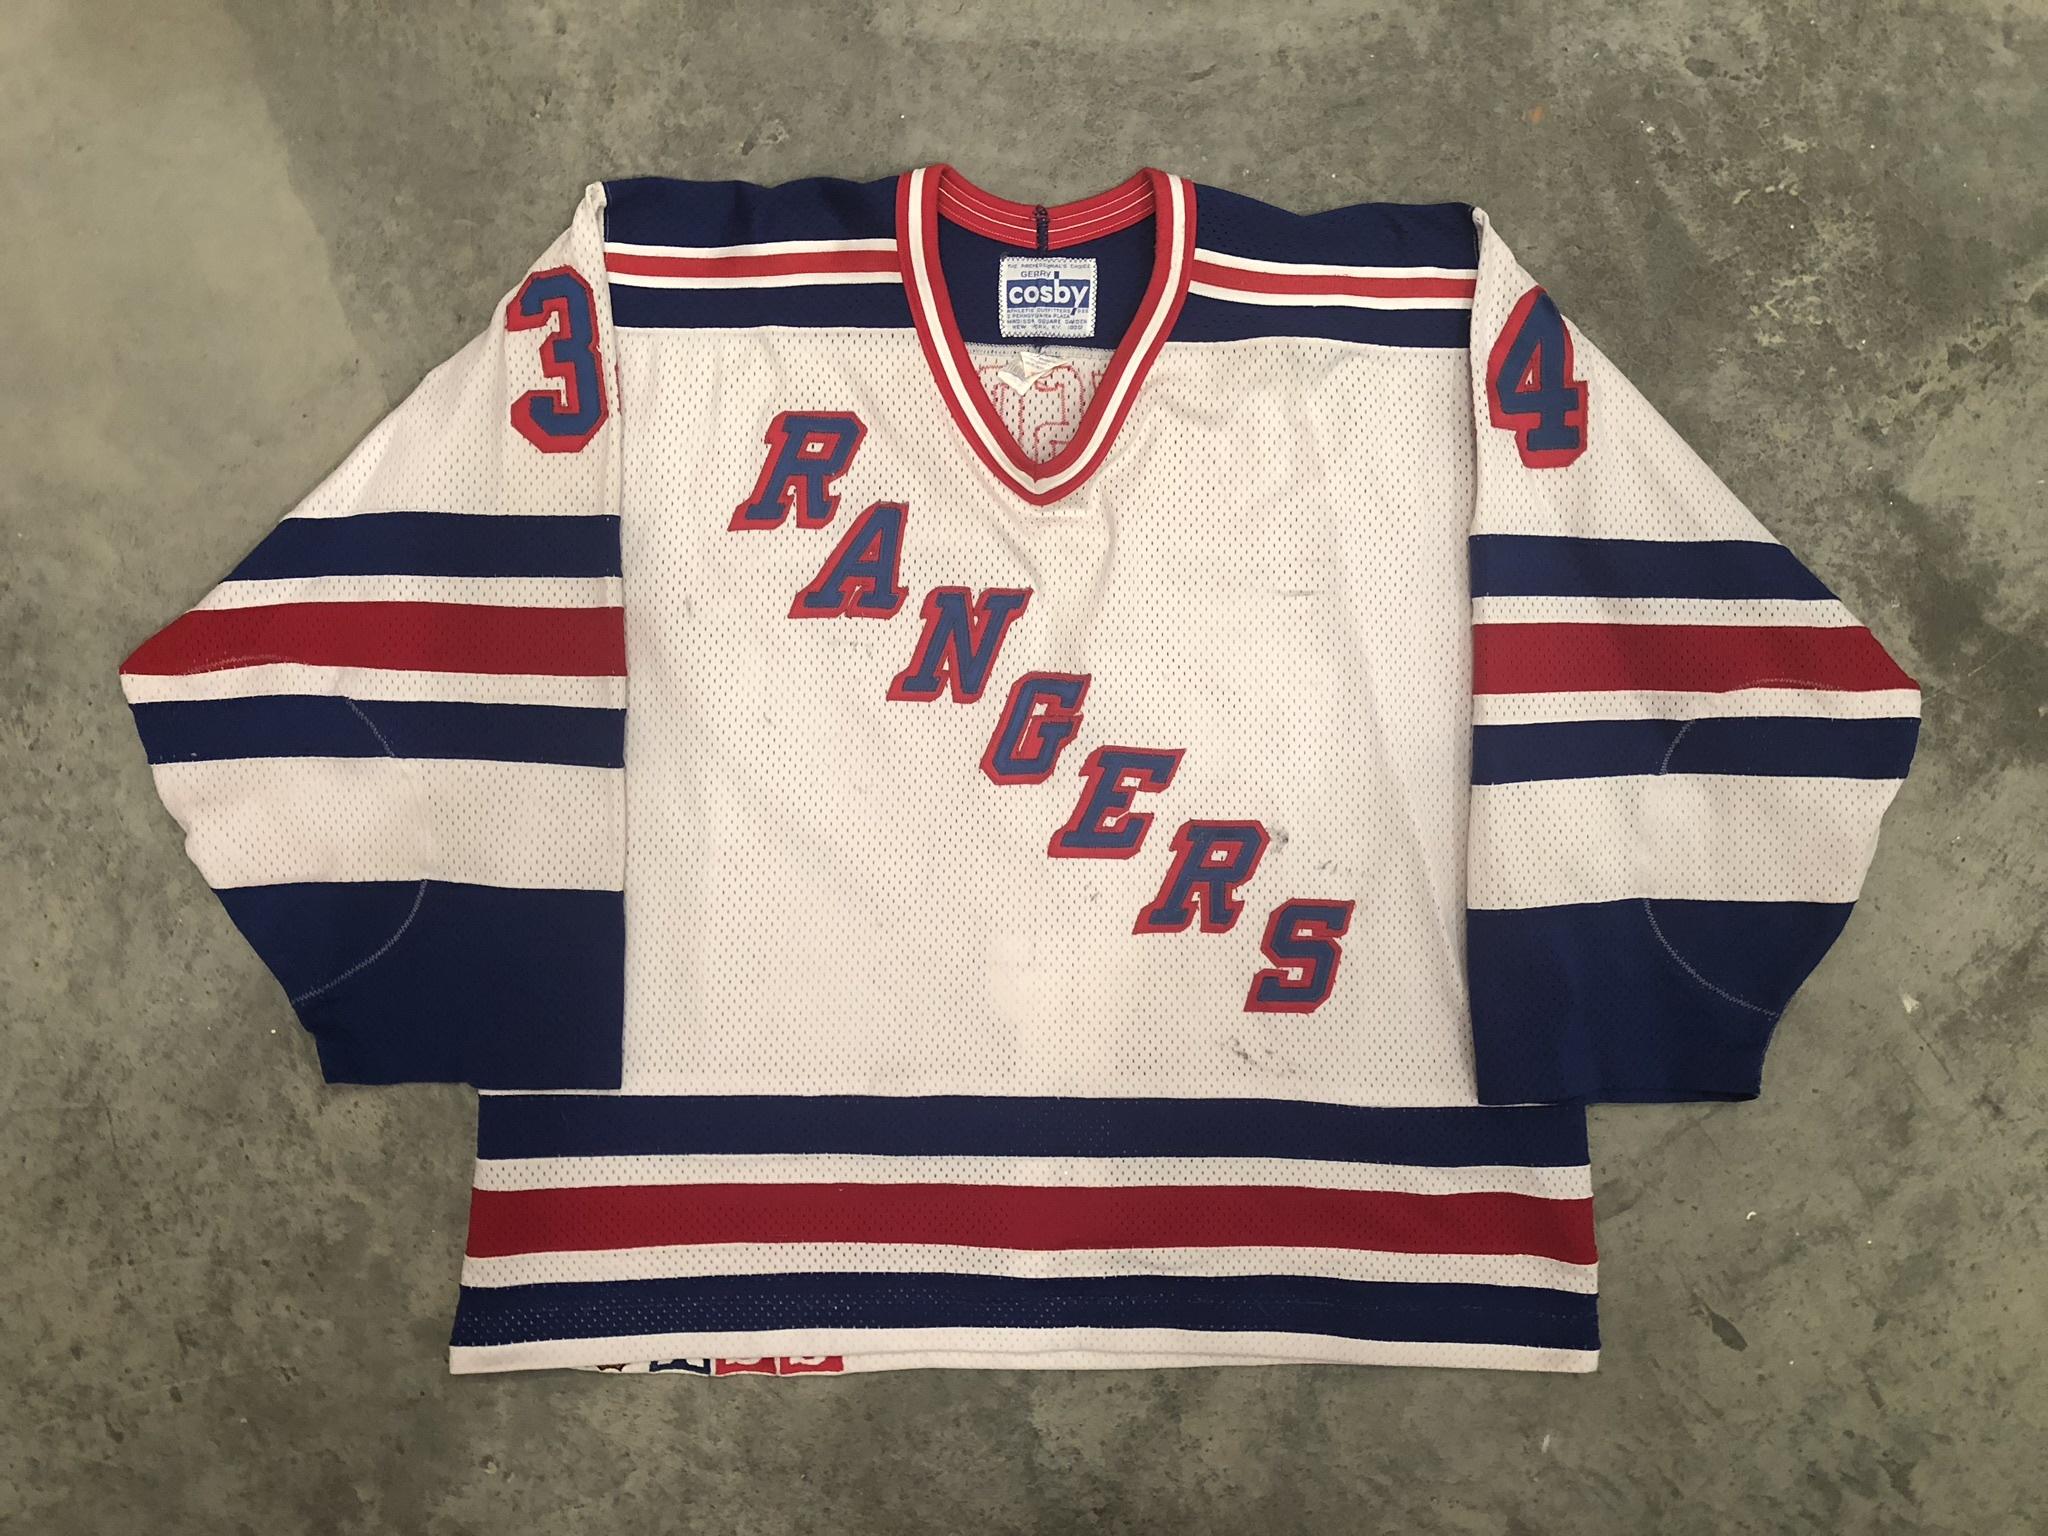 1990-91 John Vanbiesbrouck Game Worn Home Jersey